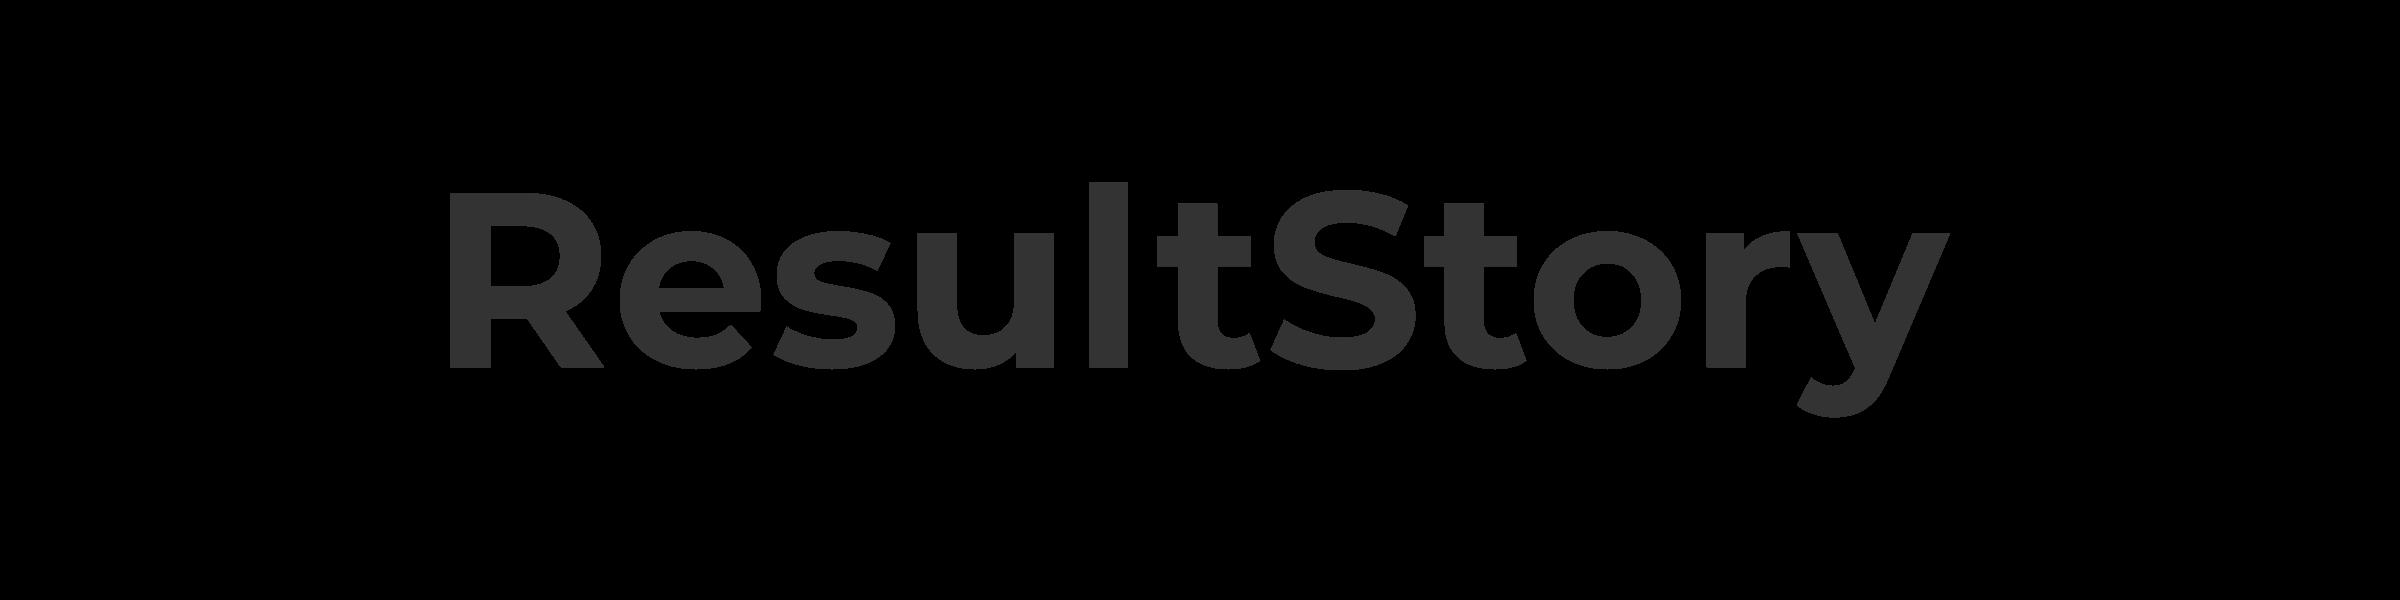 ResultStory logo